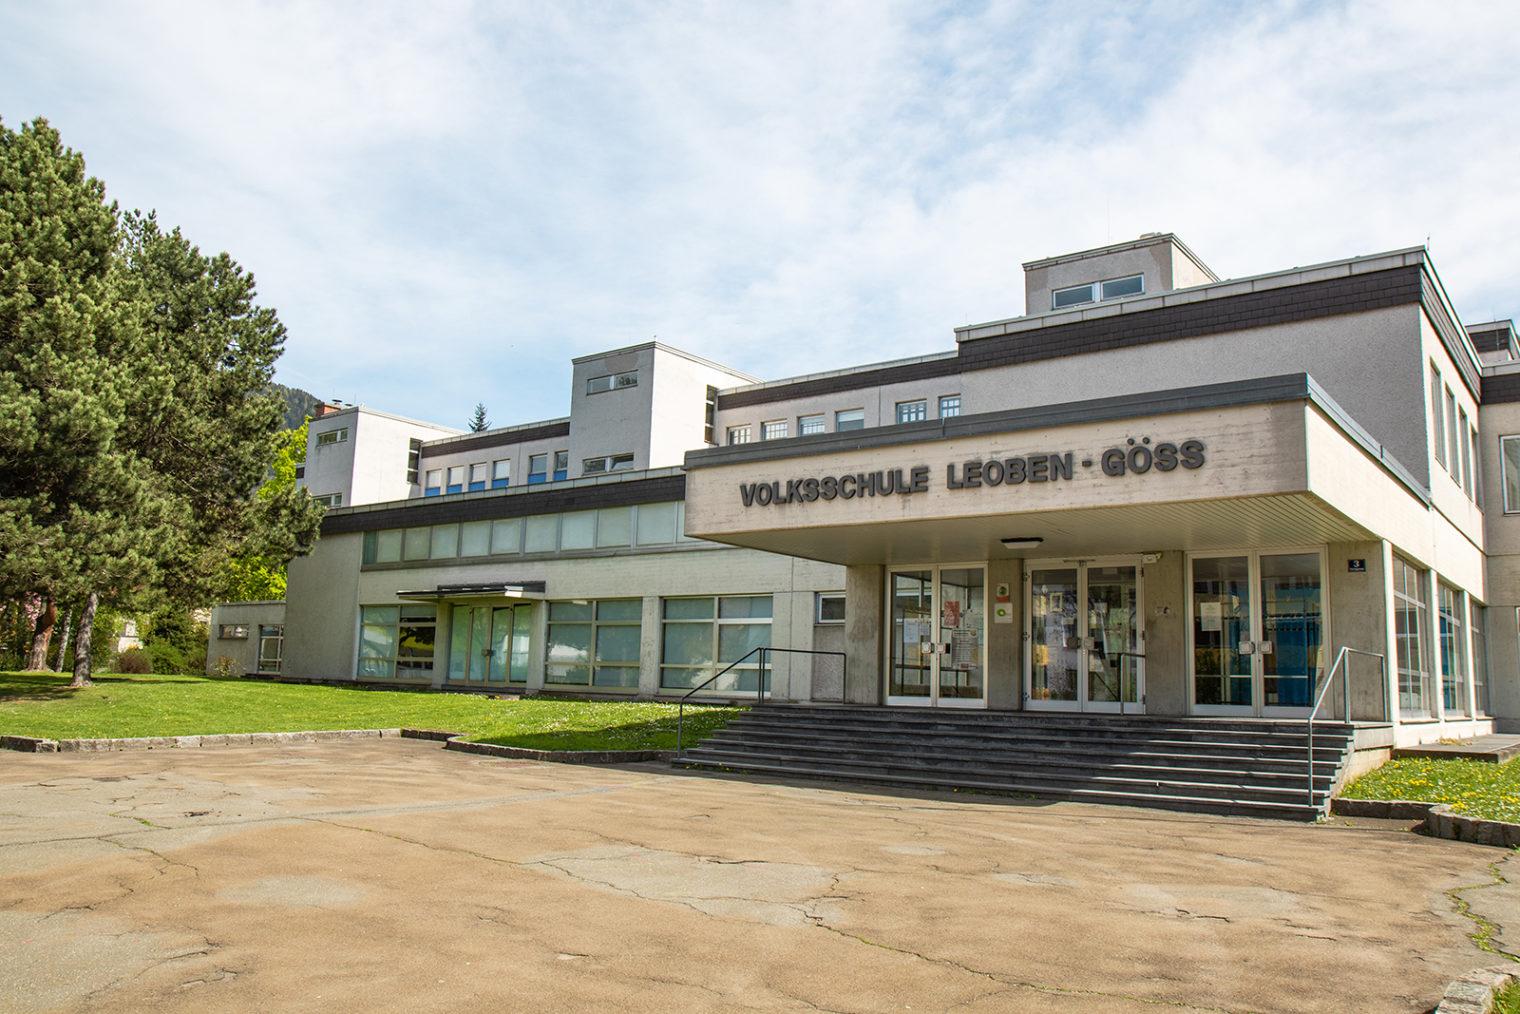 Volksschule Leoben-Göss